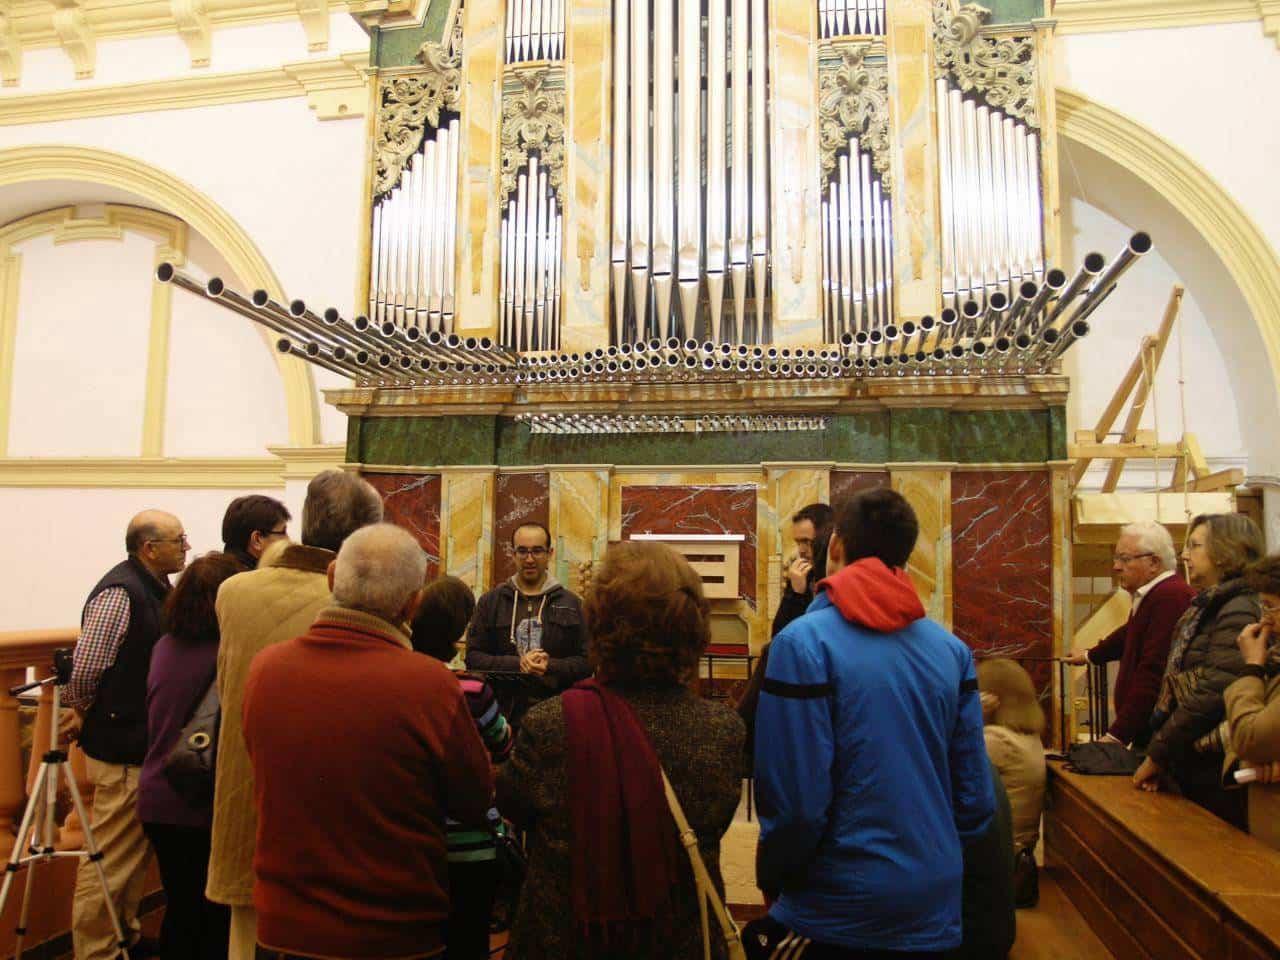 Herencia se suma a la IV Ruta de Órganos Históricos de Castilla-La Mancha 4